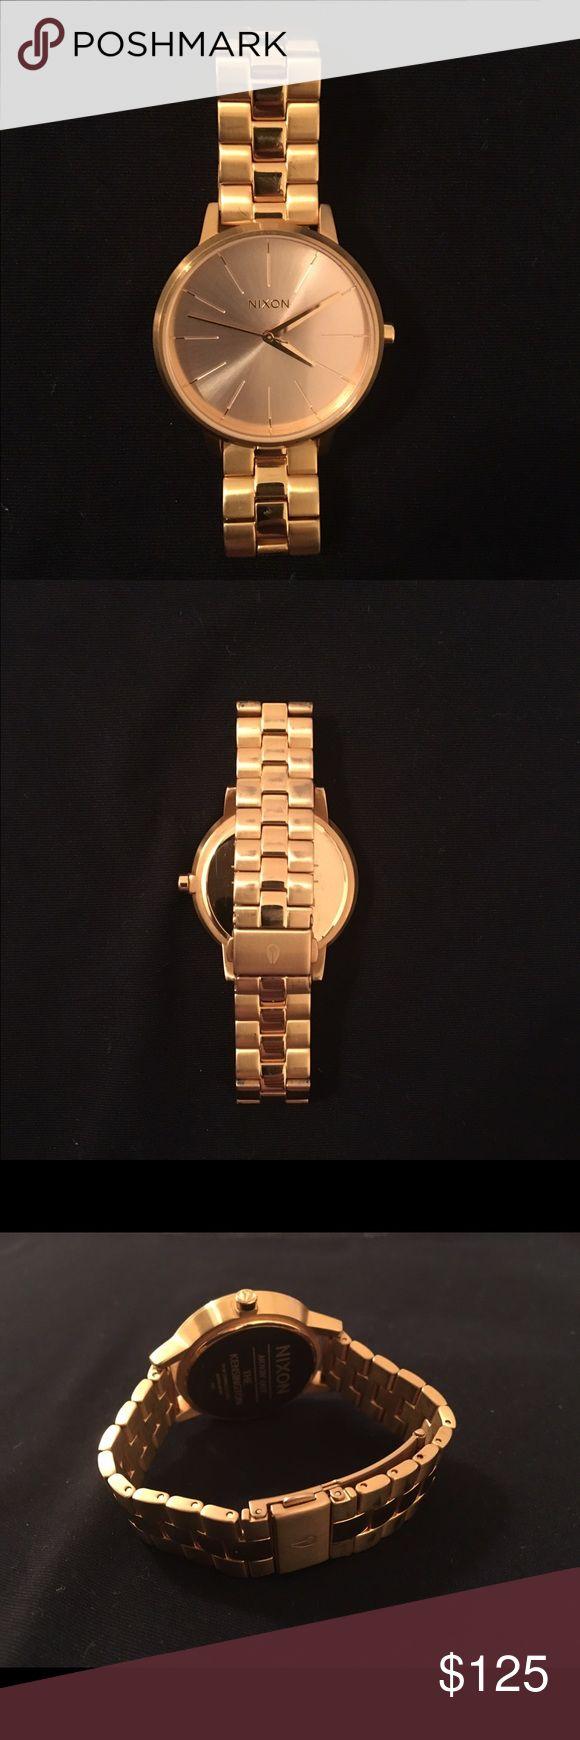 "Selling this Women's NIXON Watch ""The Kensington"" on Poshmark! My username is: ljudy11. #shopmycloset #poshmark #fashion #shopping #style #forsale #Accessories"